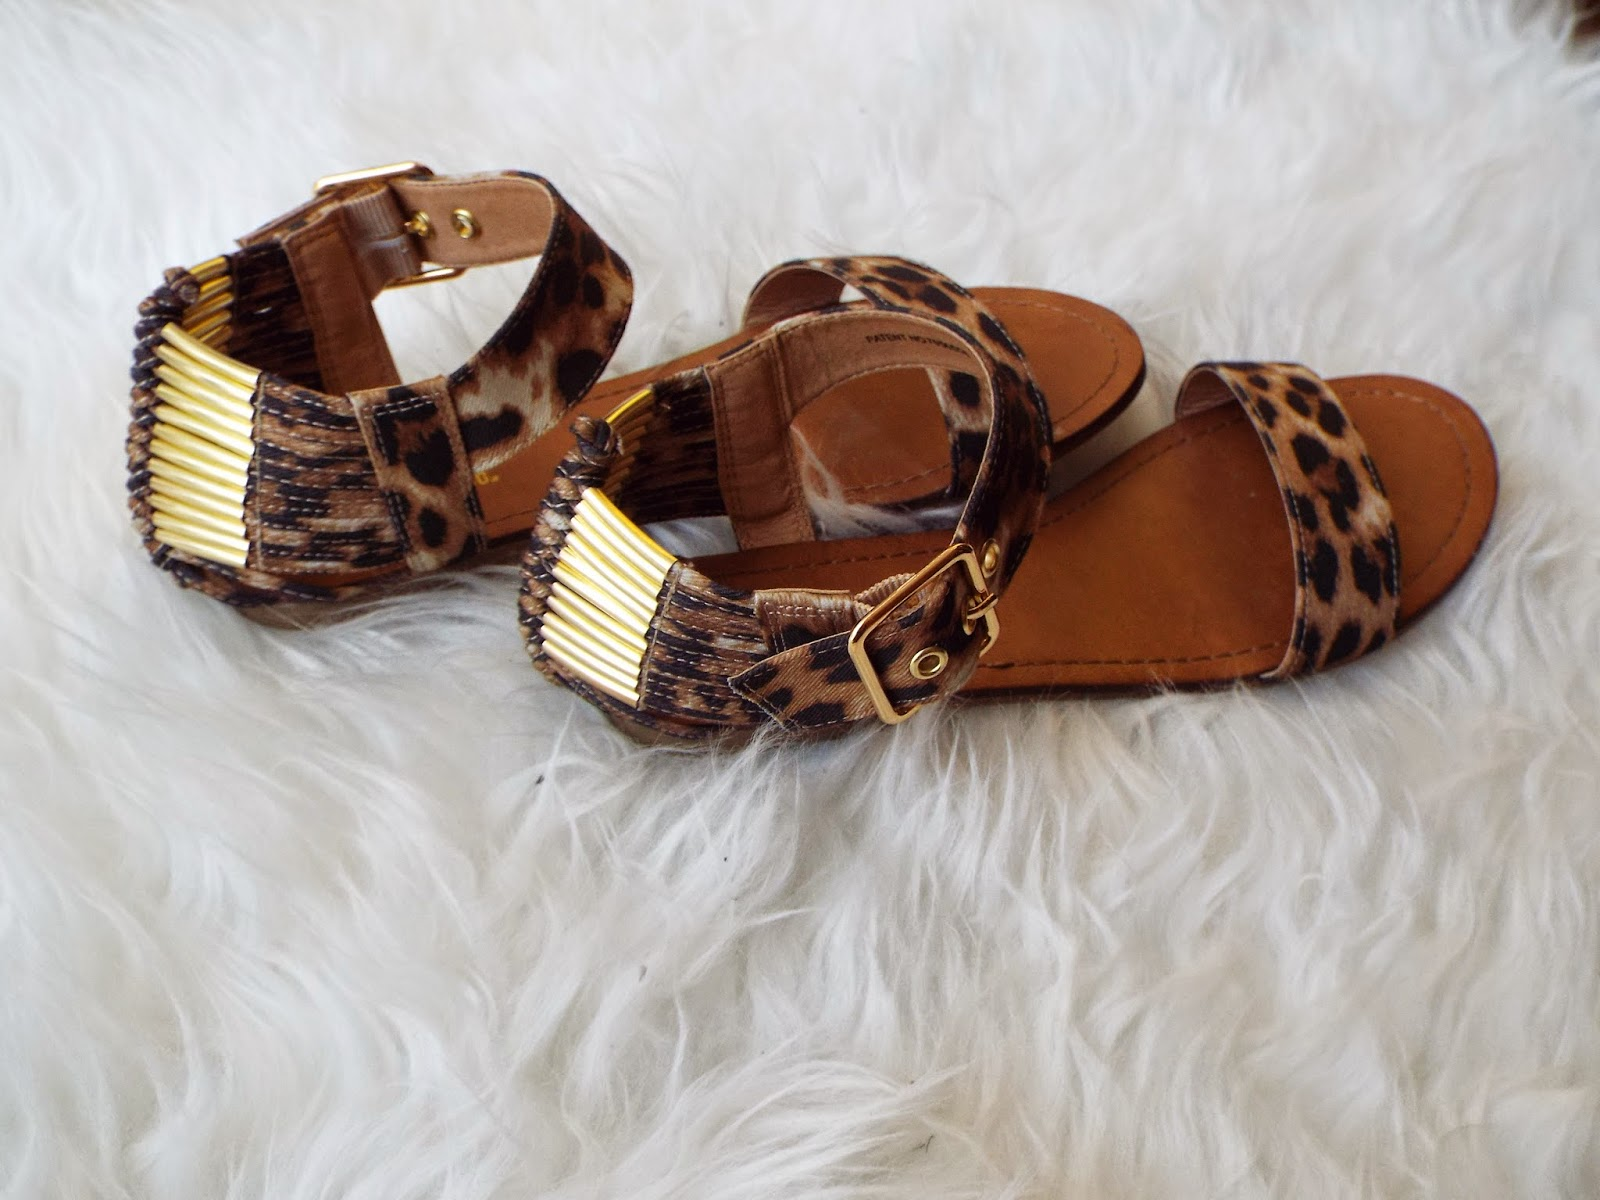 target sandals, sandals, leopard print sandals